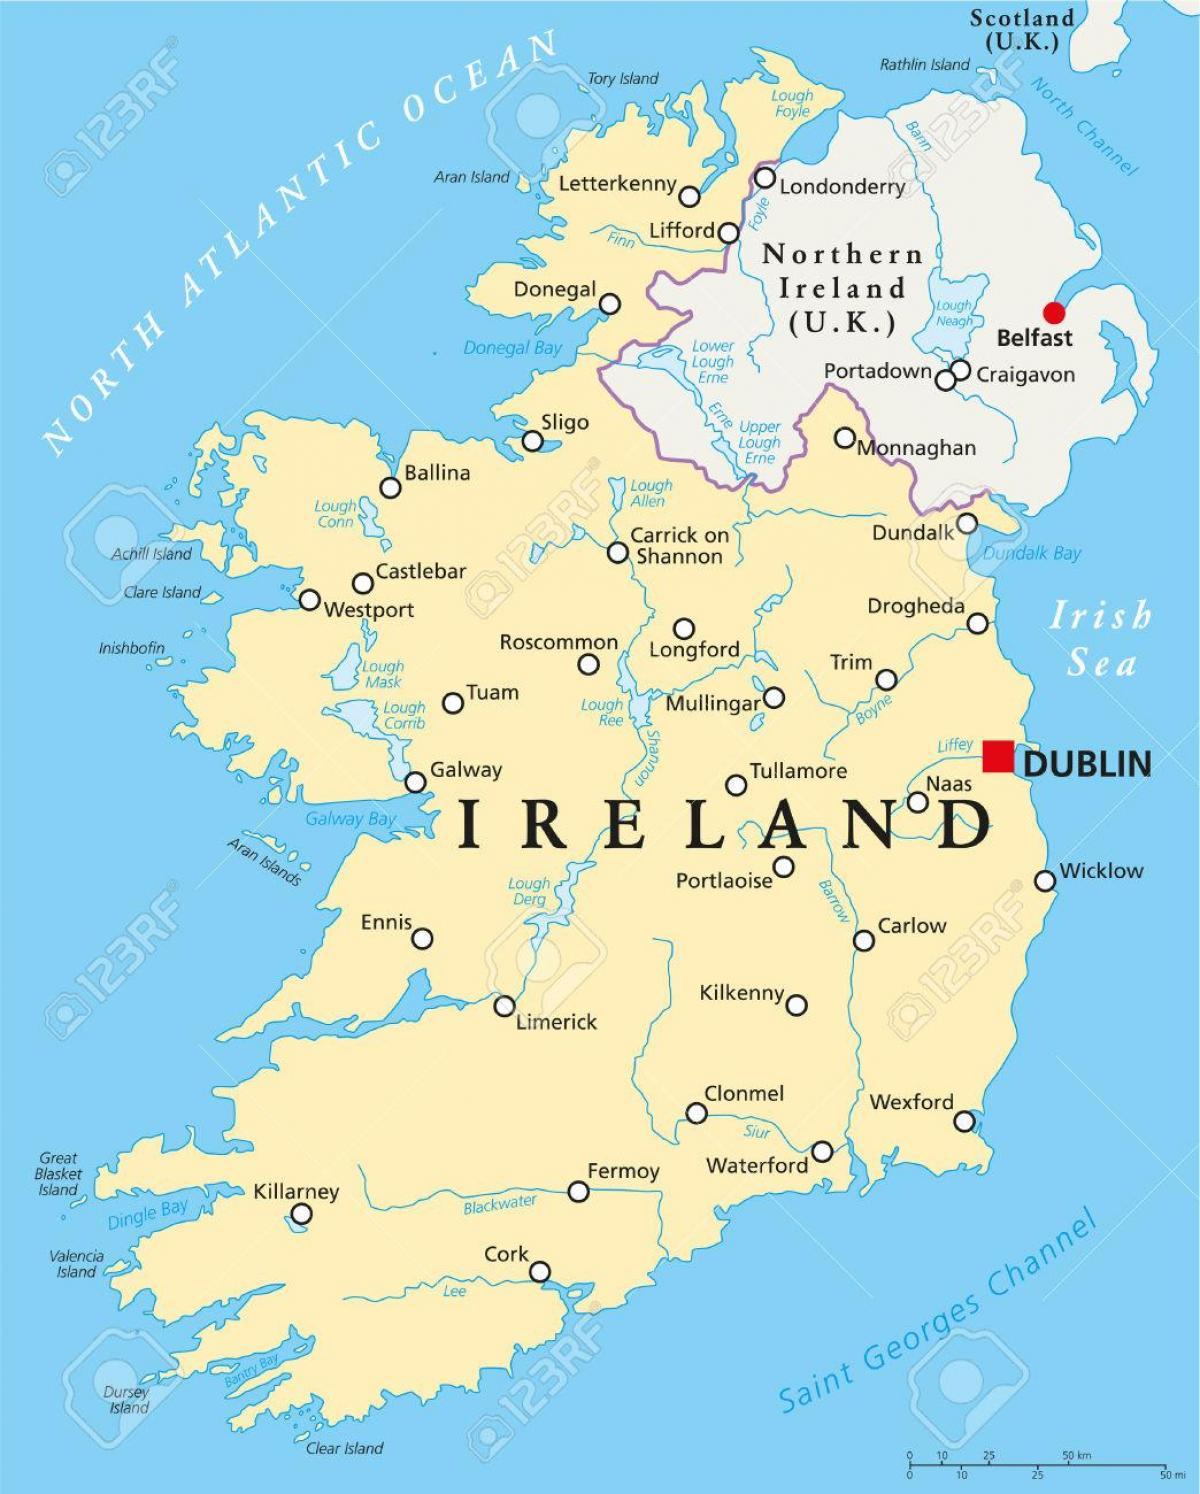 barefoot bay fl map dublin ireland map my blog. barefoot bay fl map aa space coast brevard intergroup inc sw